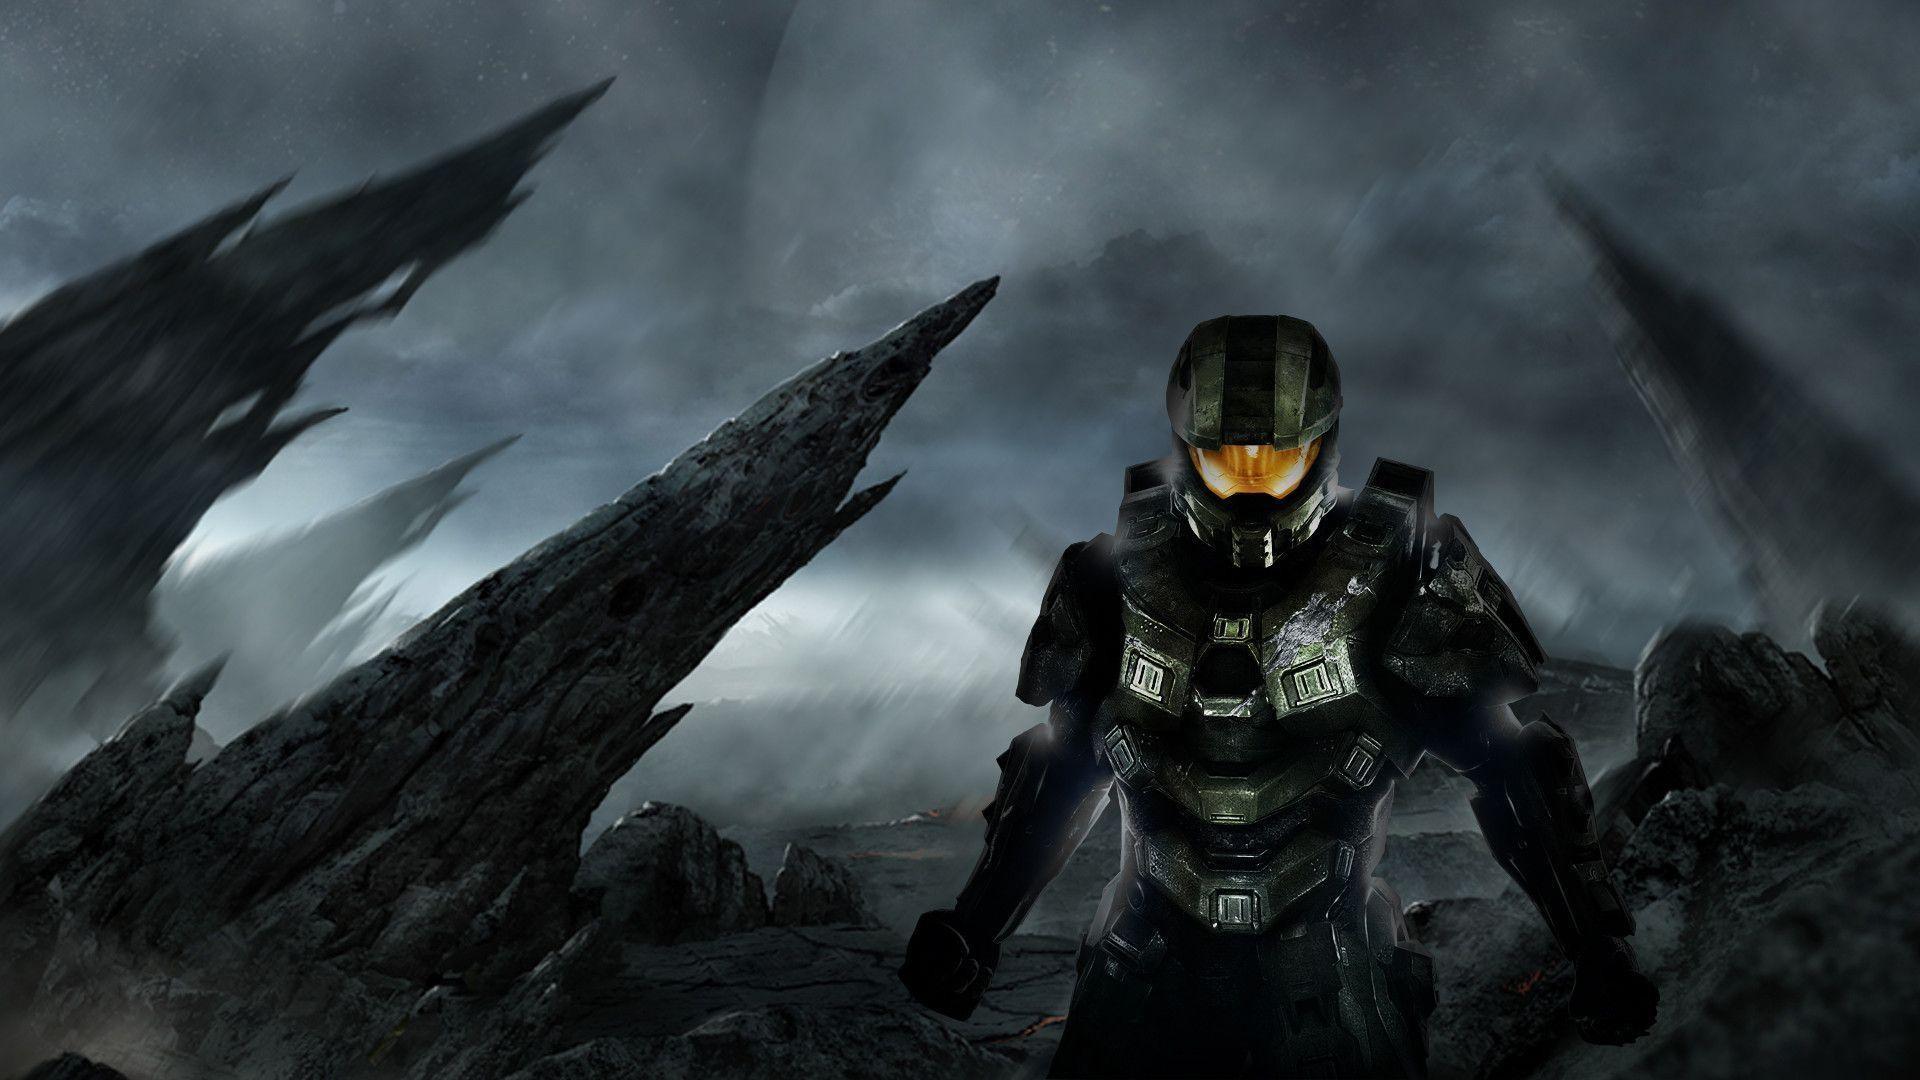 Halo 5 1080p Full HD Wallpaper Free Download # #1414 HD Game .